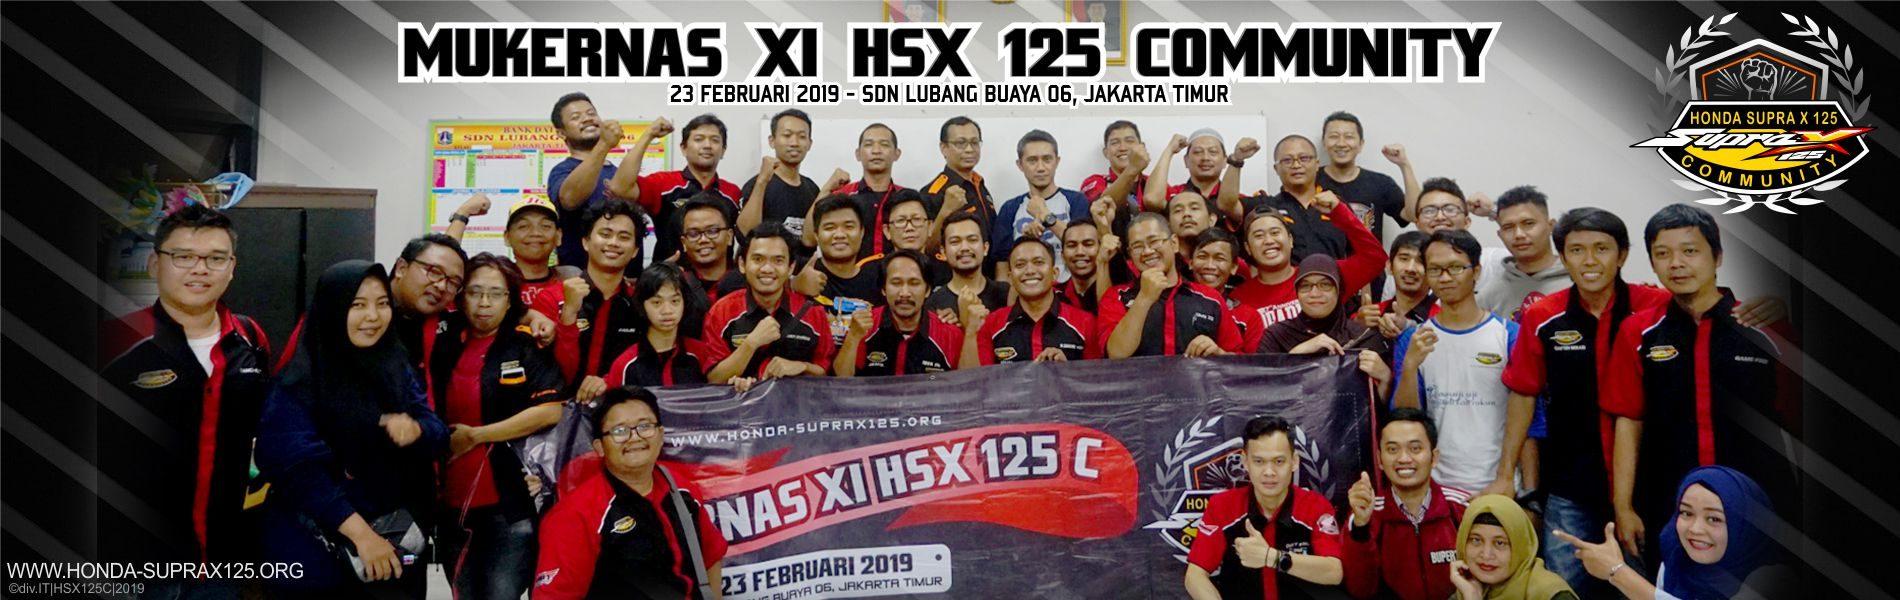 Honda Supra X 125 Community